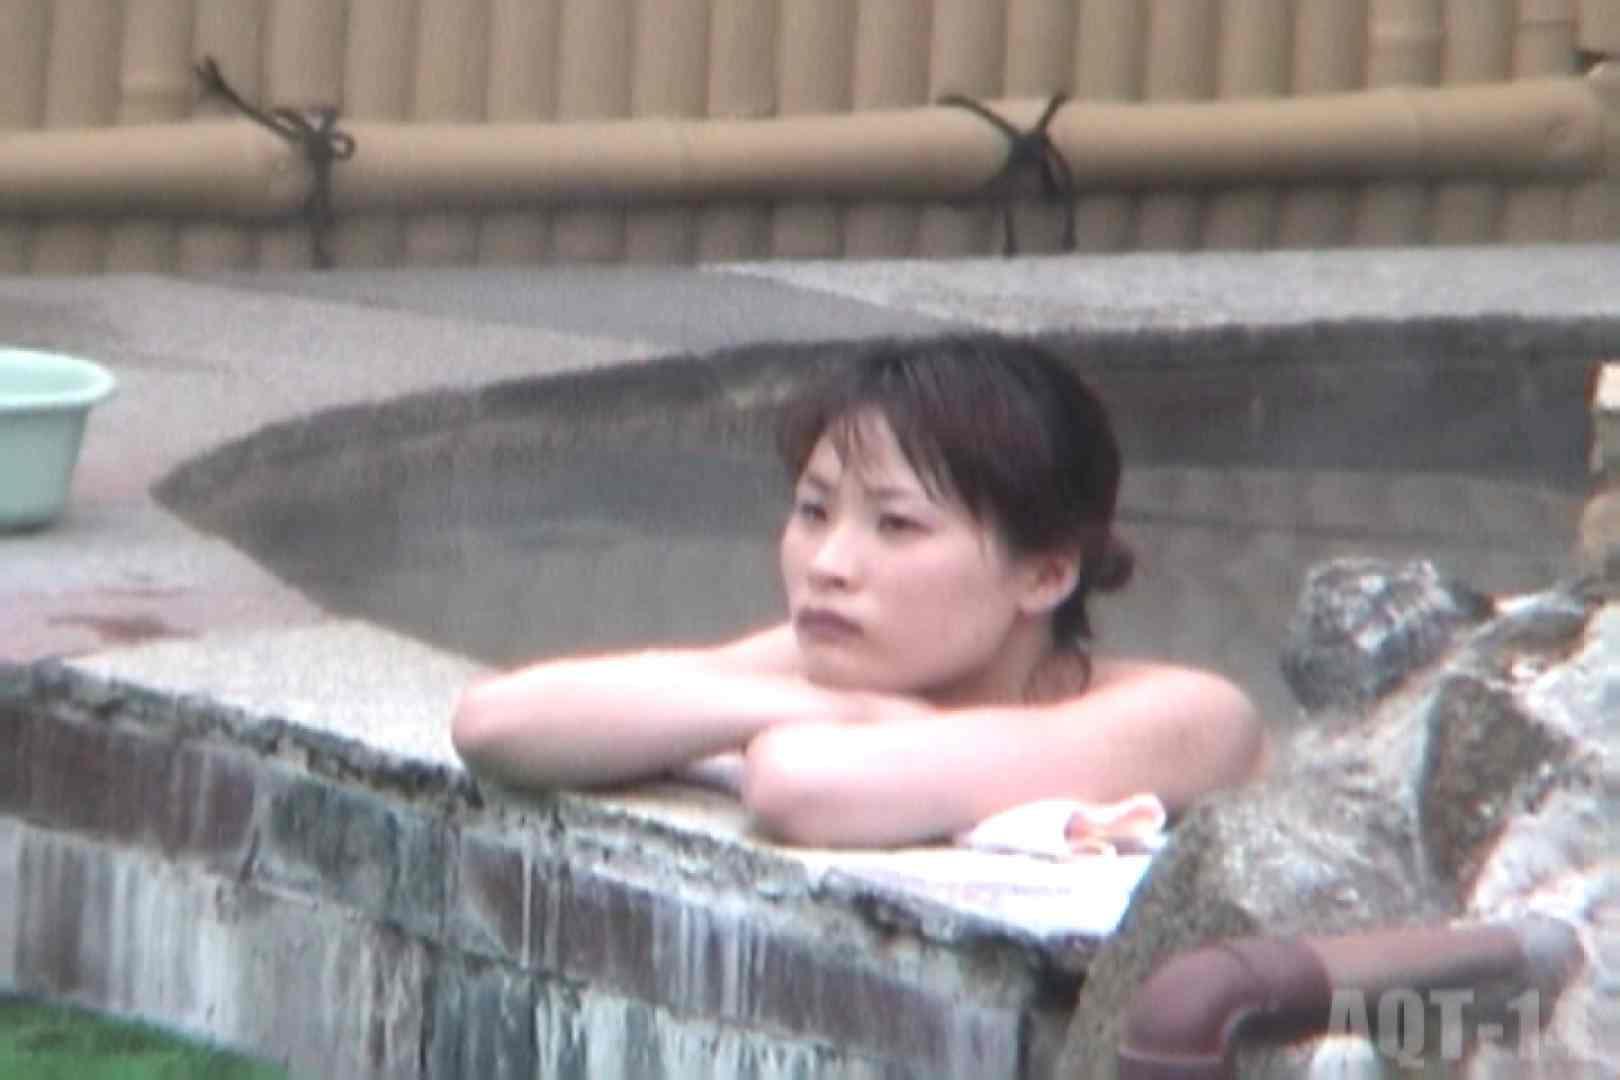 Aquaな露天風呂Vol.822 露天 すけべAV動画紹介 98連発 3